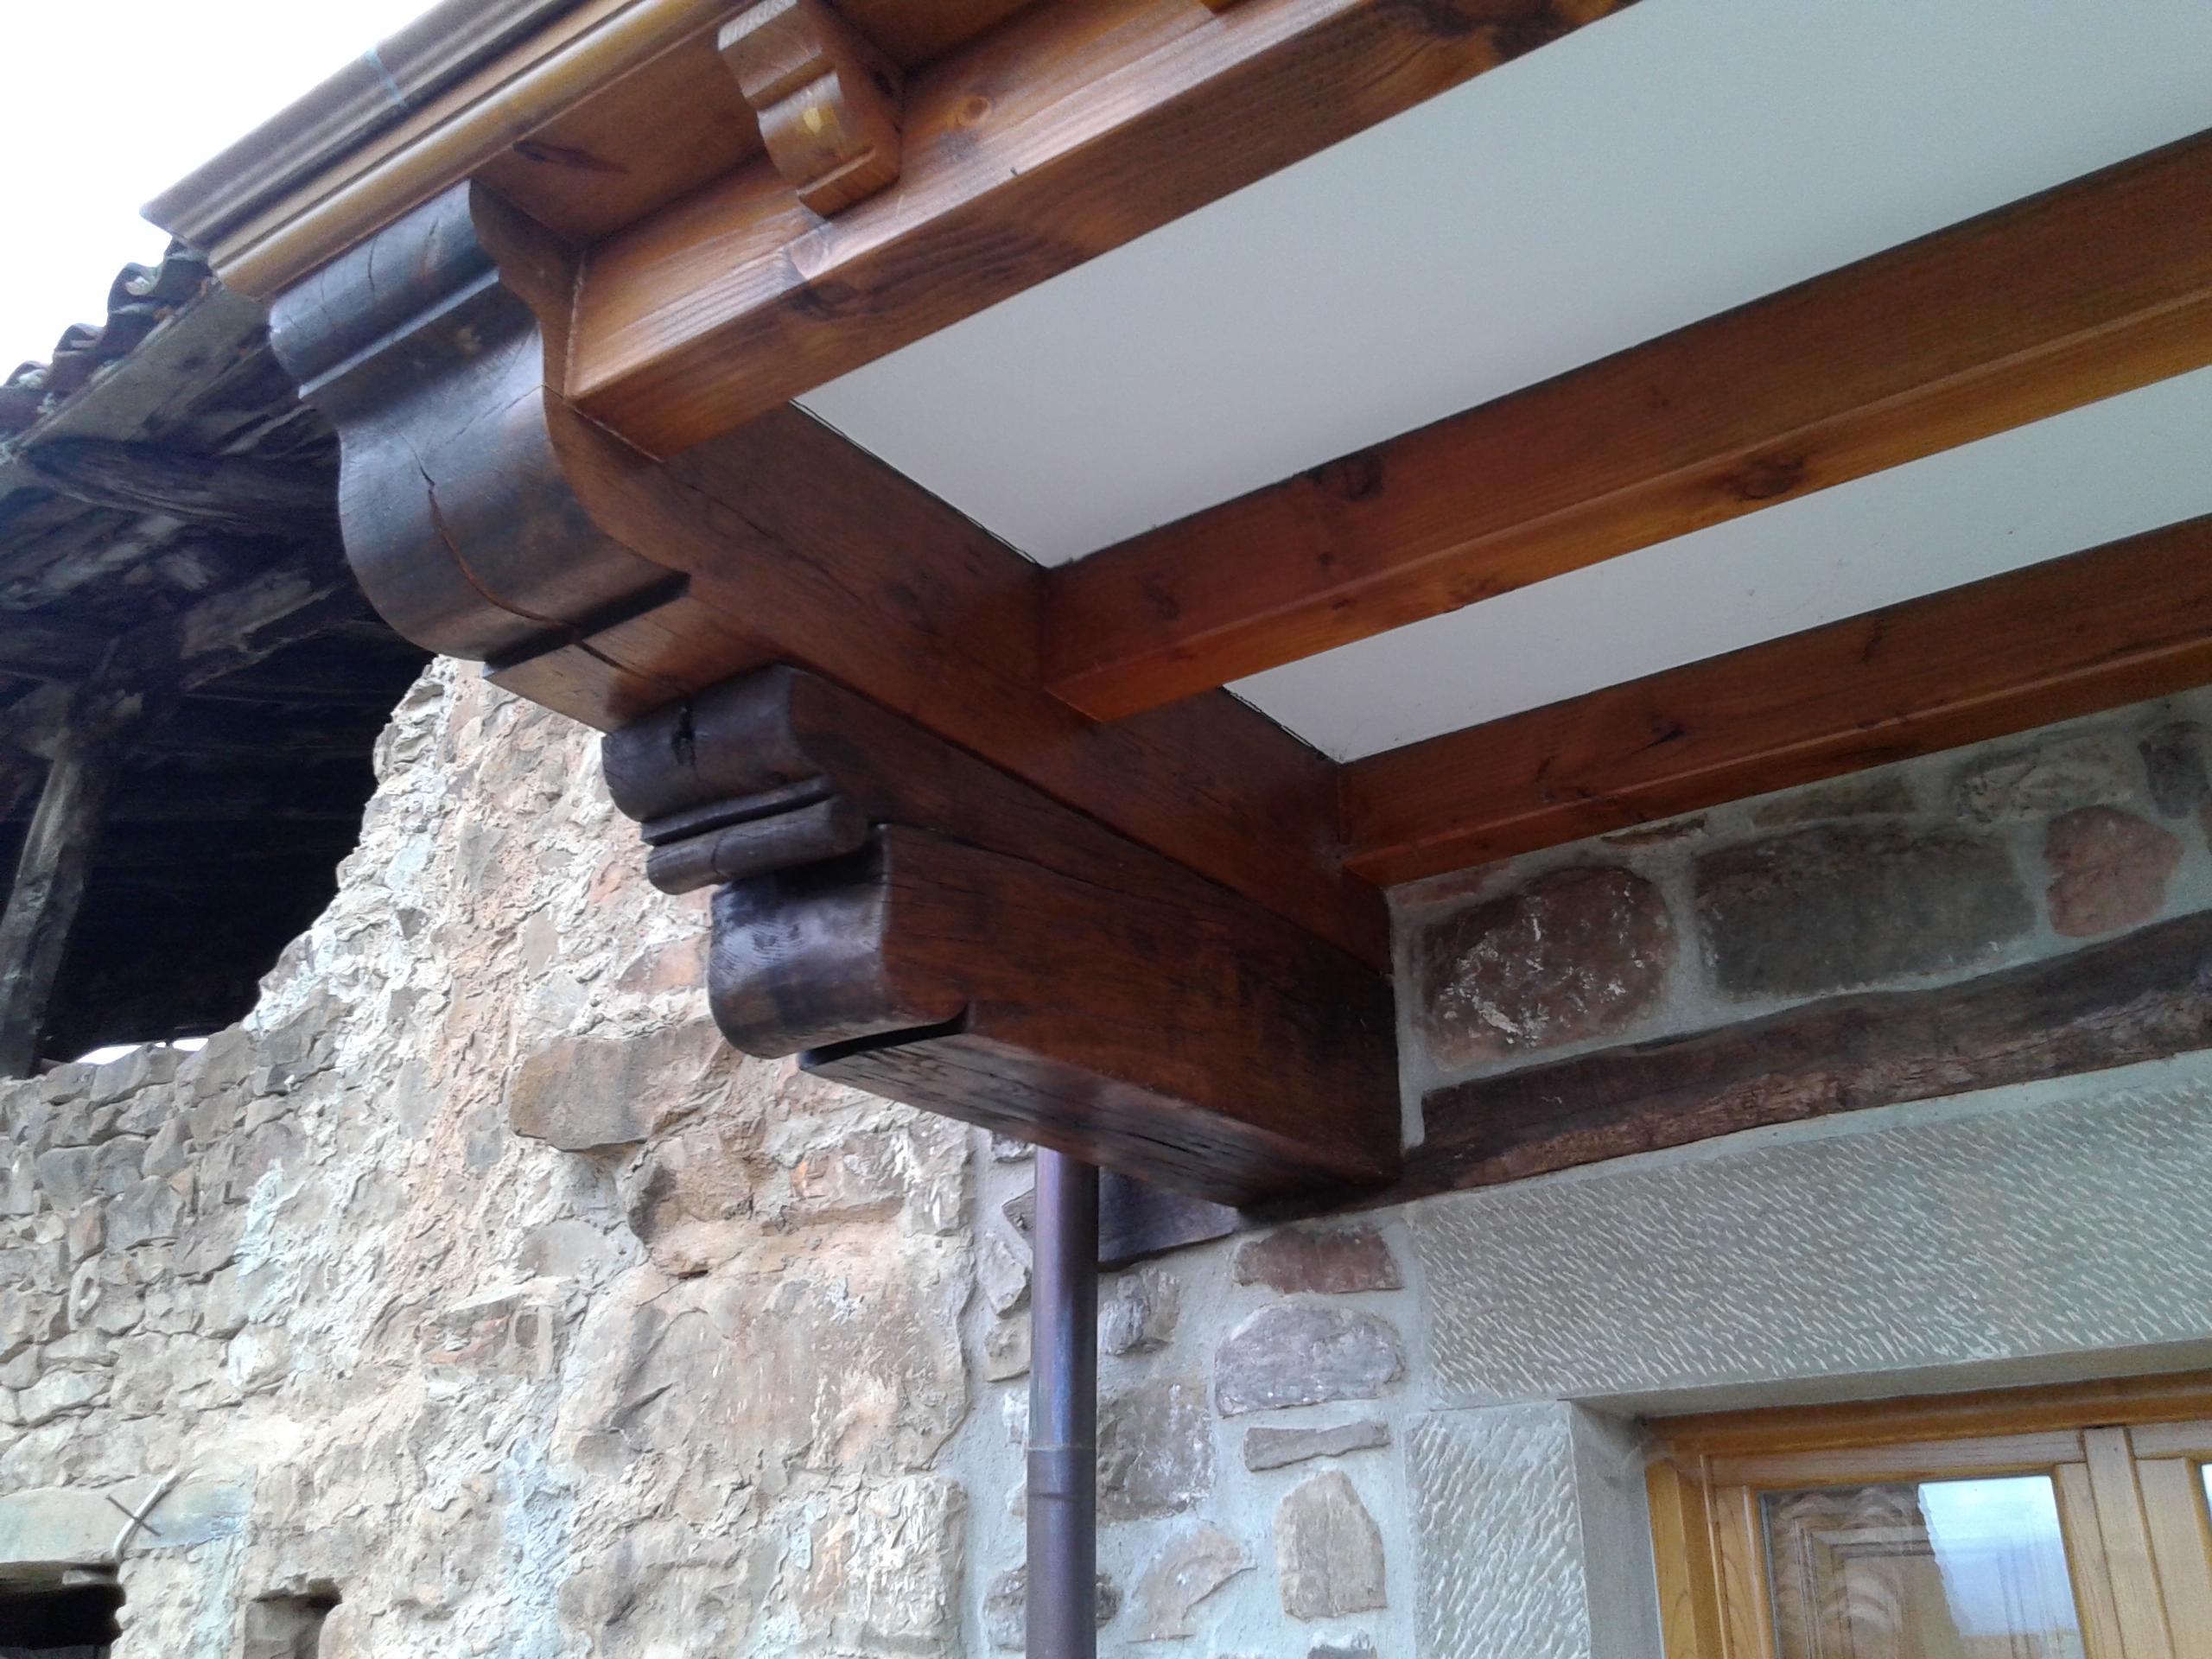 Cambiar vigas de madera closeup de un interruptor elctrico caja clavado a una viga de madera en - Cambiar vigas de madera ...